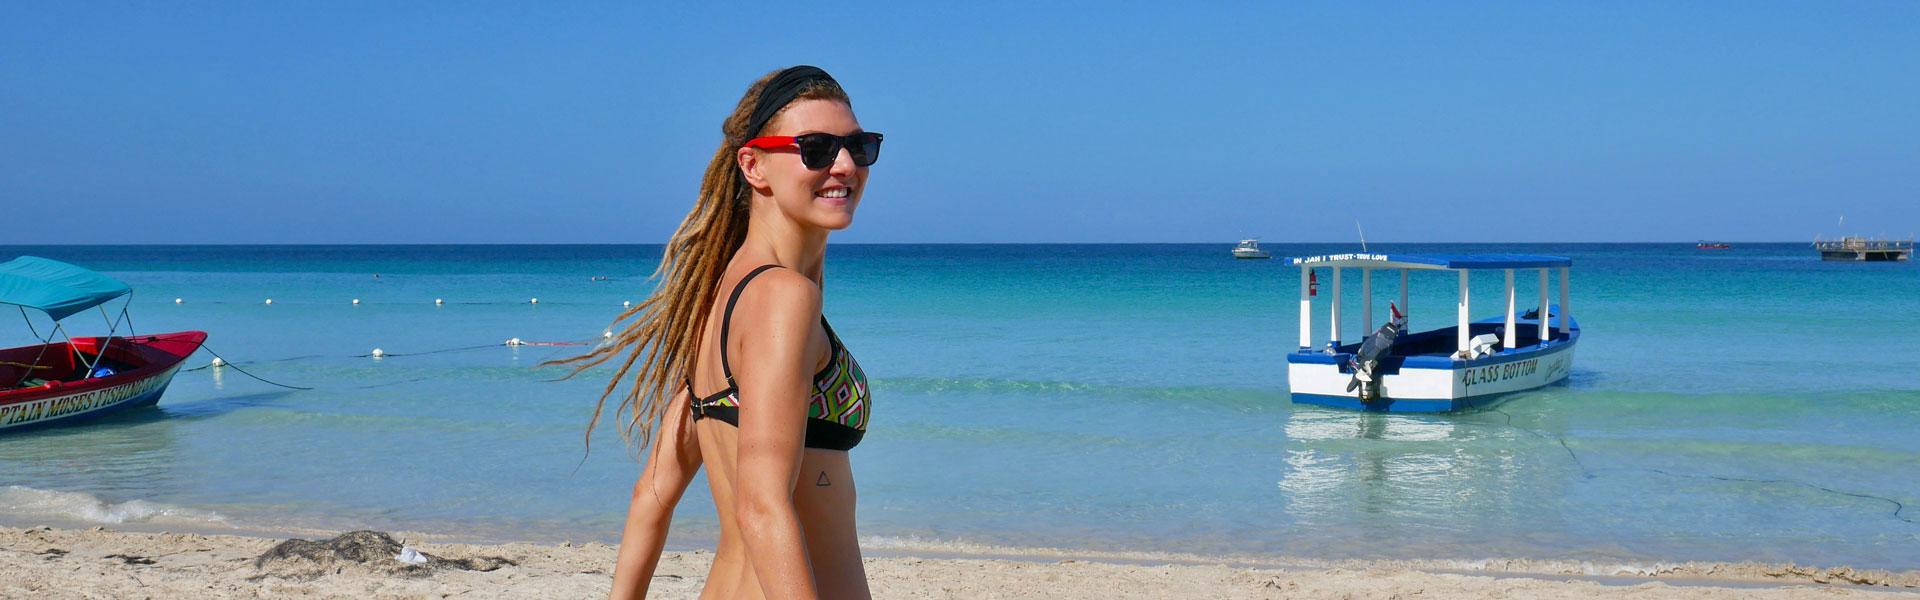 Rasta girl at Seven Mile Beach, Negril, Jamaica